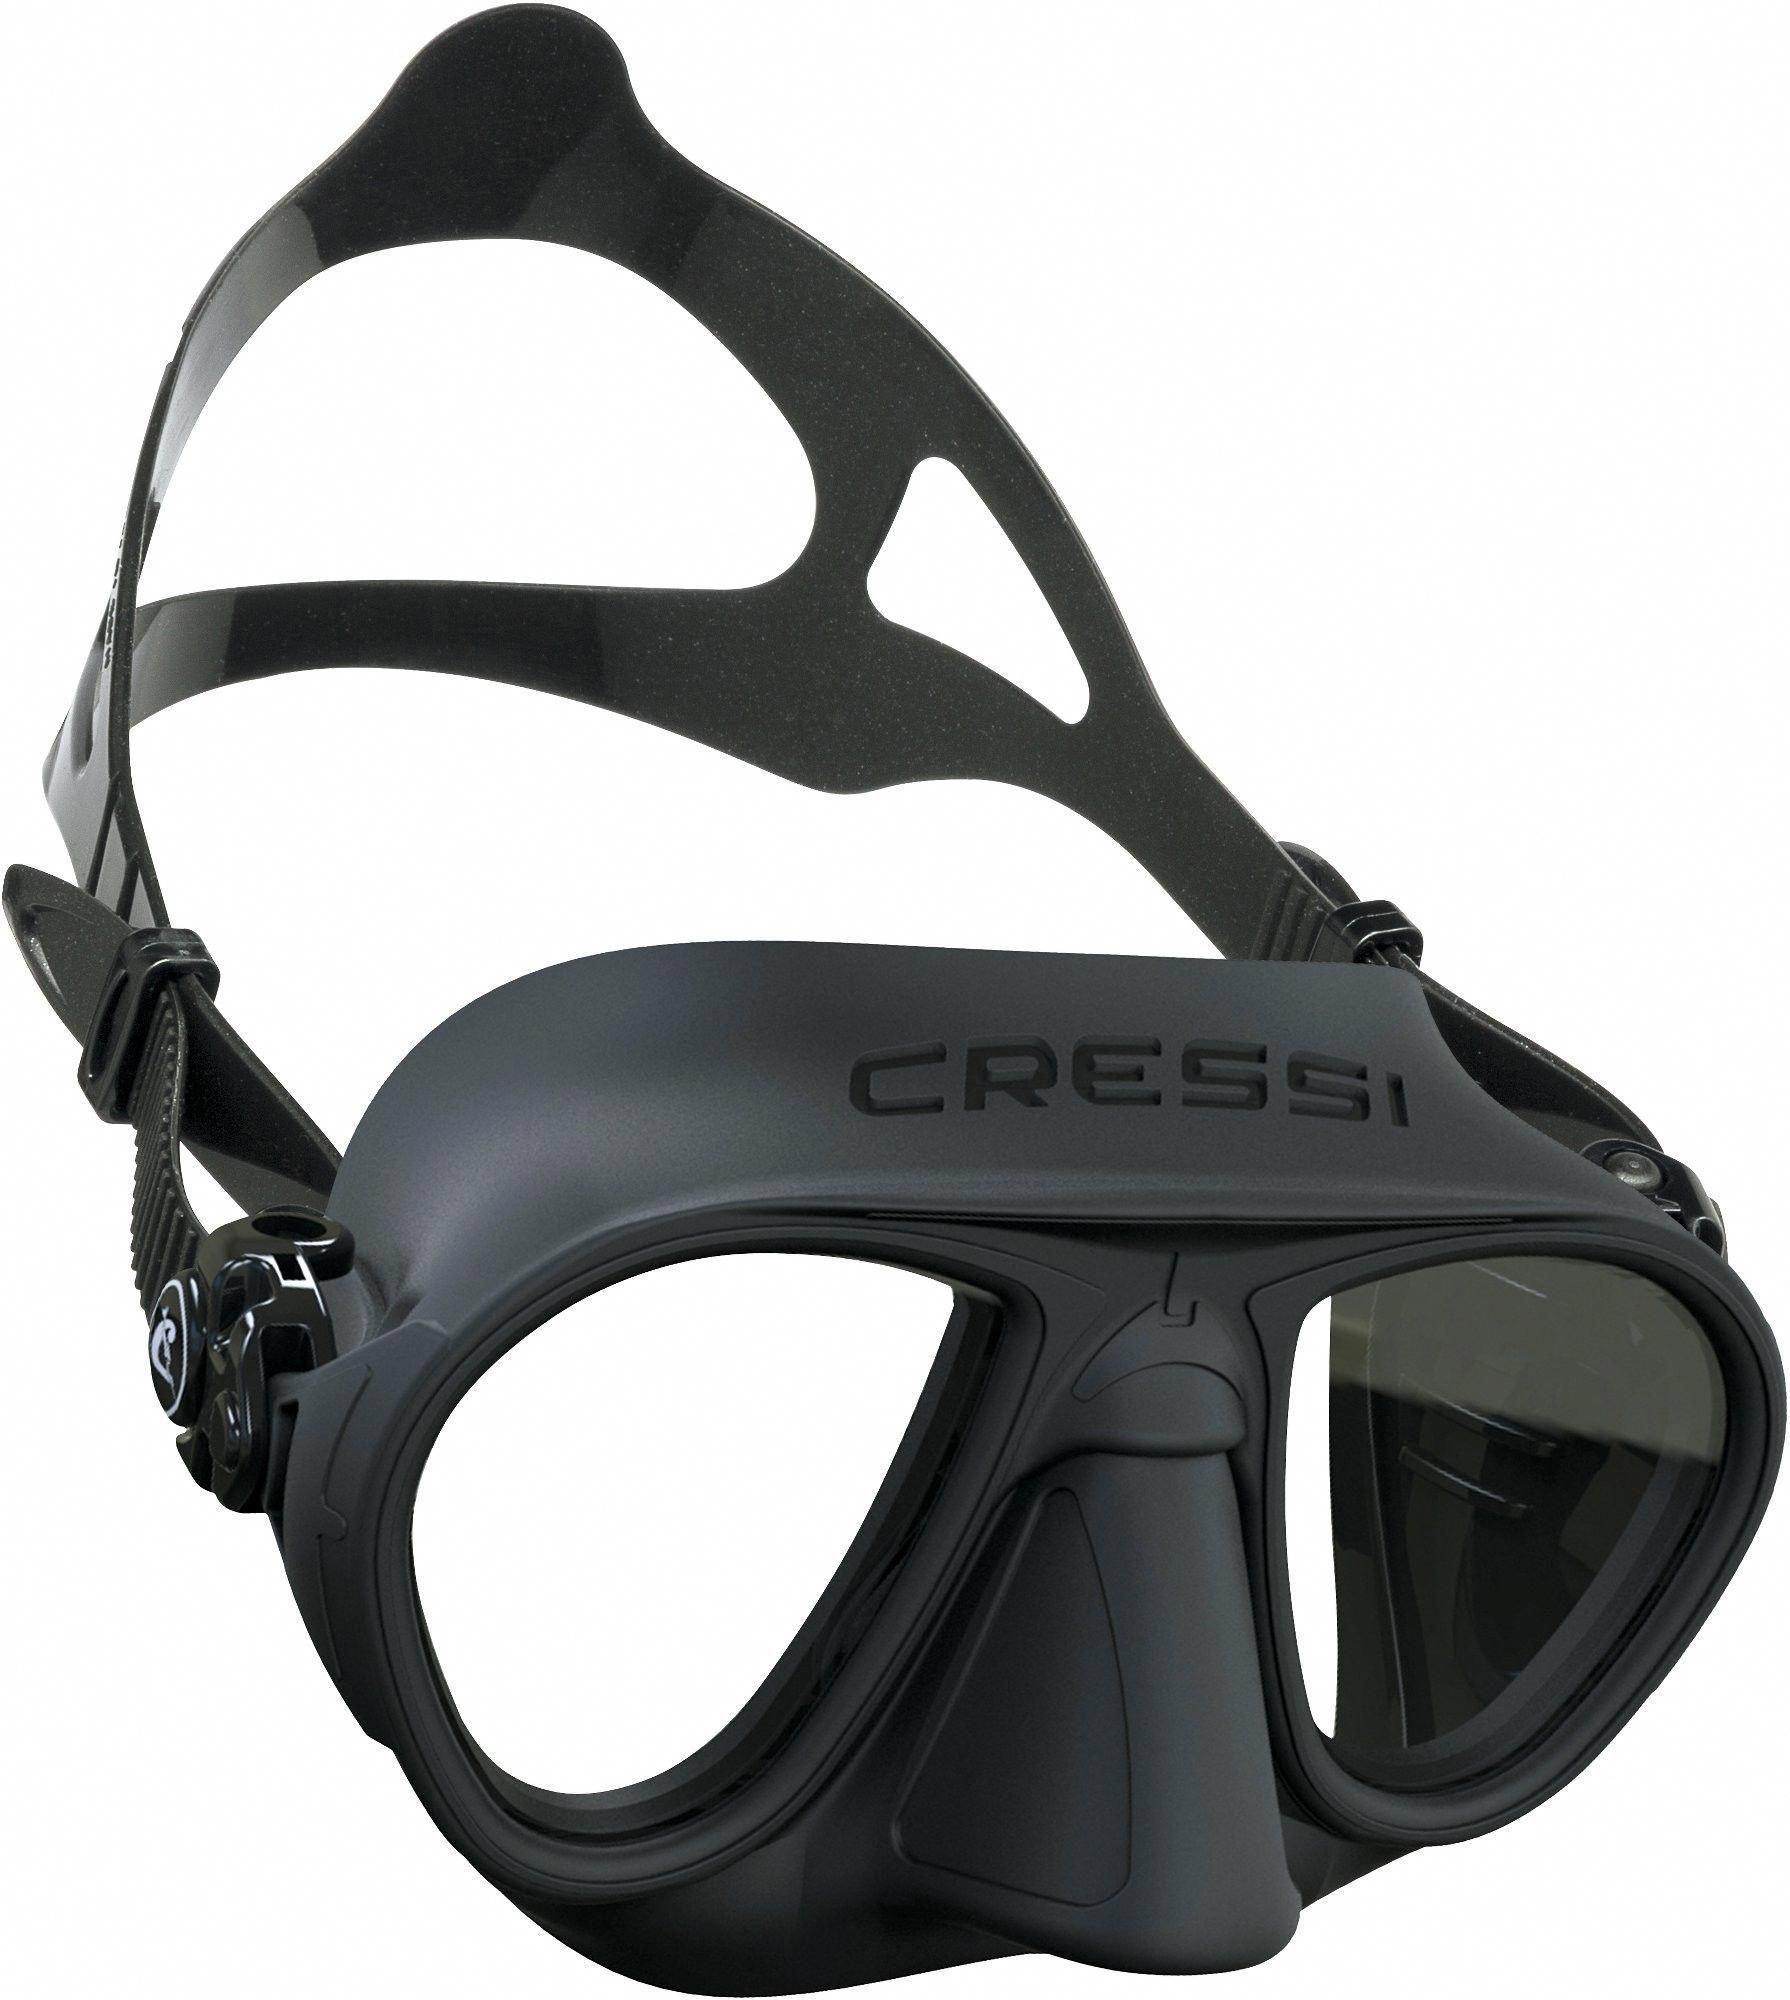 Cressi Masks Masks Calibro Cressi Professional Scuba Diving Equipment Scubadivingequipmenttraining Scubadivi Scuba Diving Gear Scuba Diving Mask Spearfishing